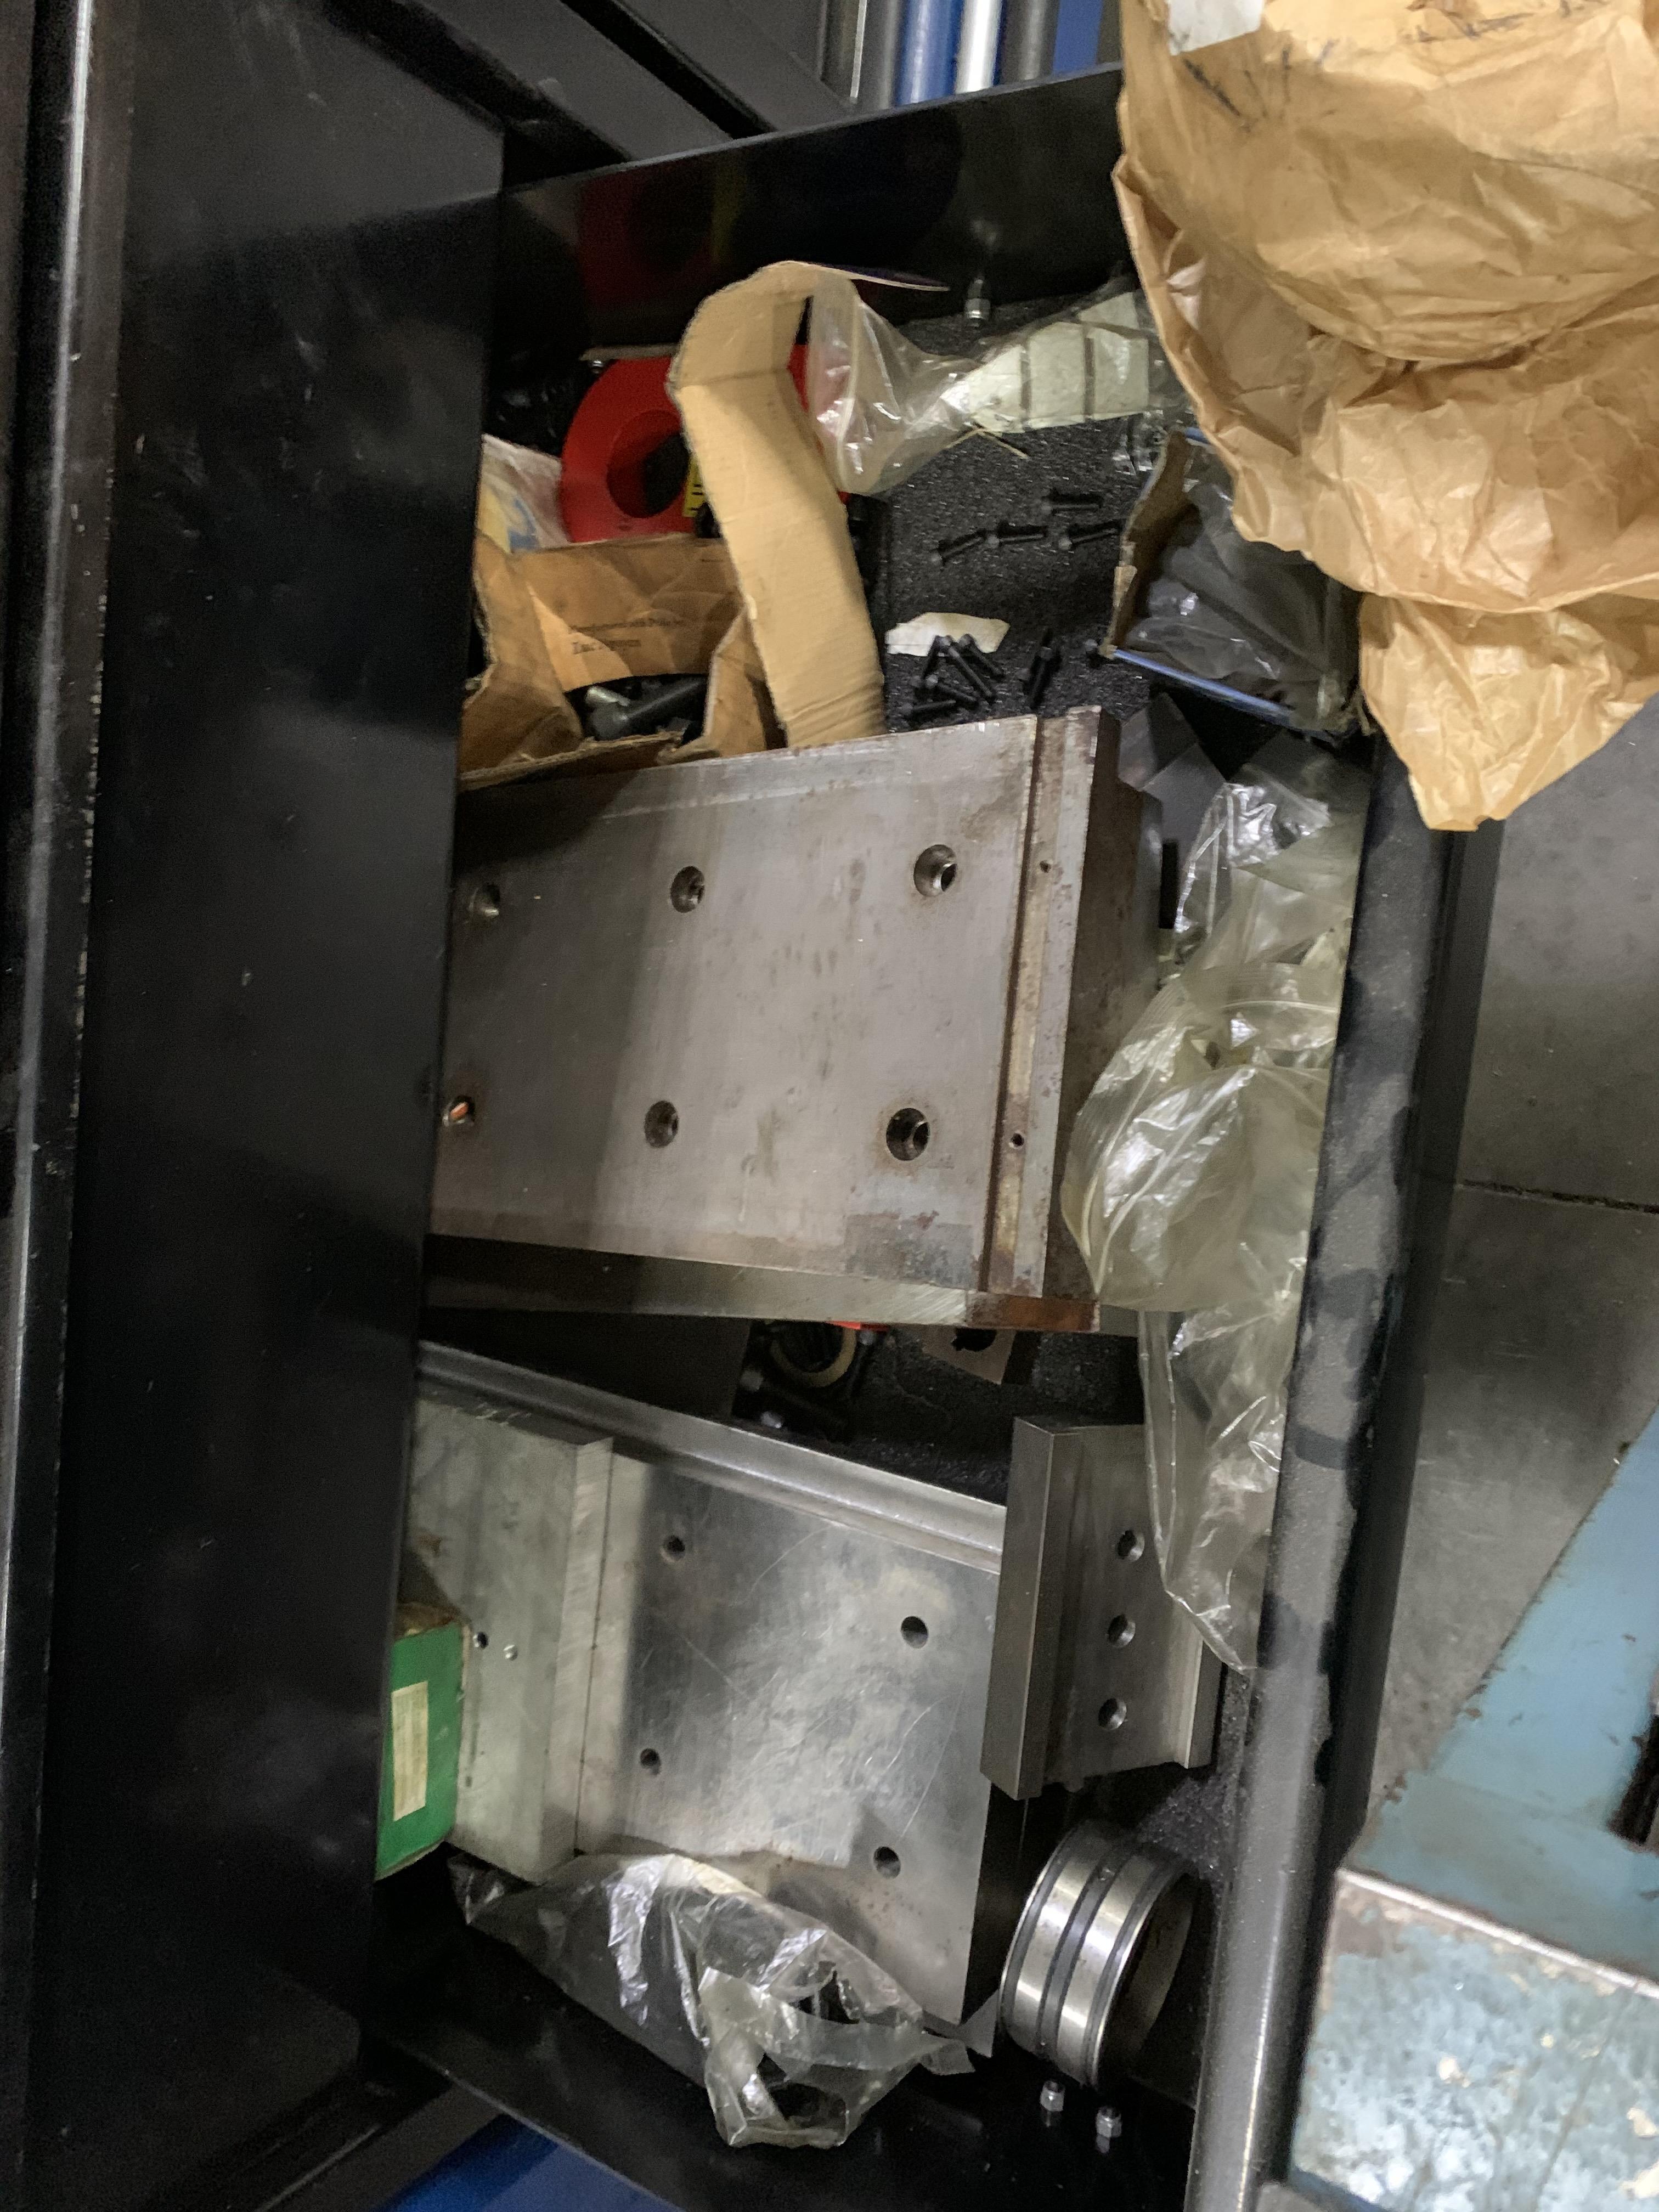 "6"" UNISON MODEL 6"" MS RH ELECTRIC CNC MULTI-STACK TUBE BENDER; S/N 2715, JOB NO. ME 4-410,(NEW 2014) - Image 61 of 72"